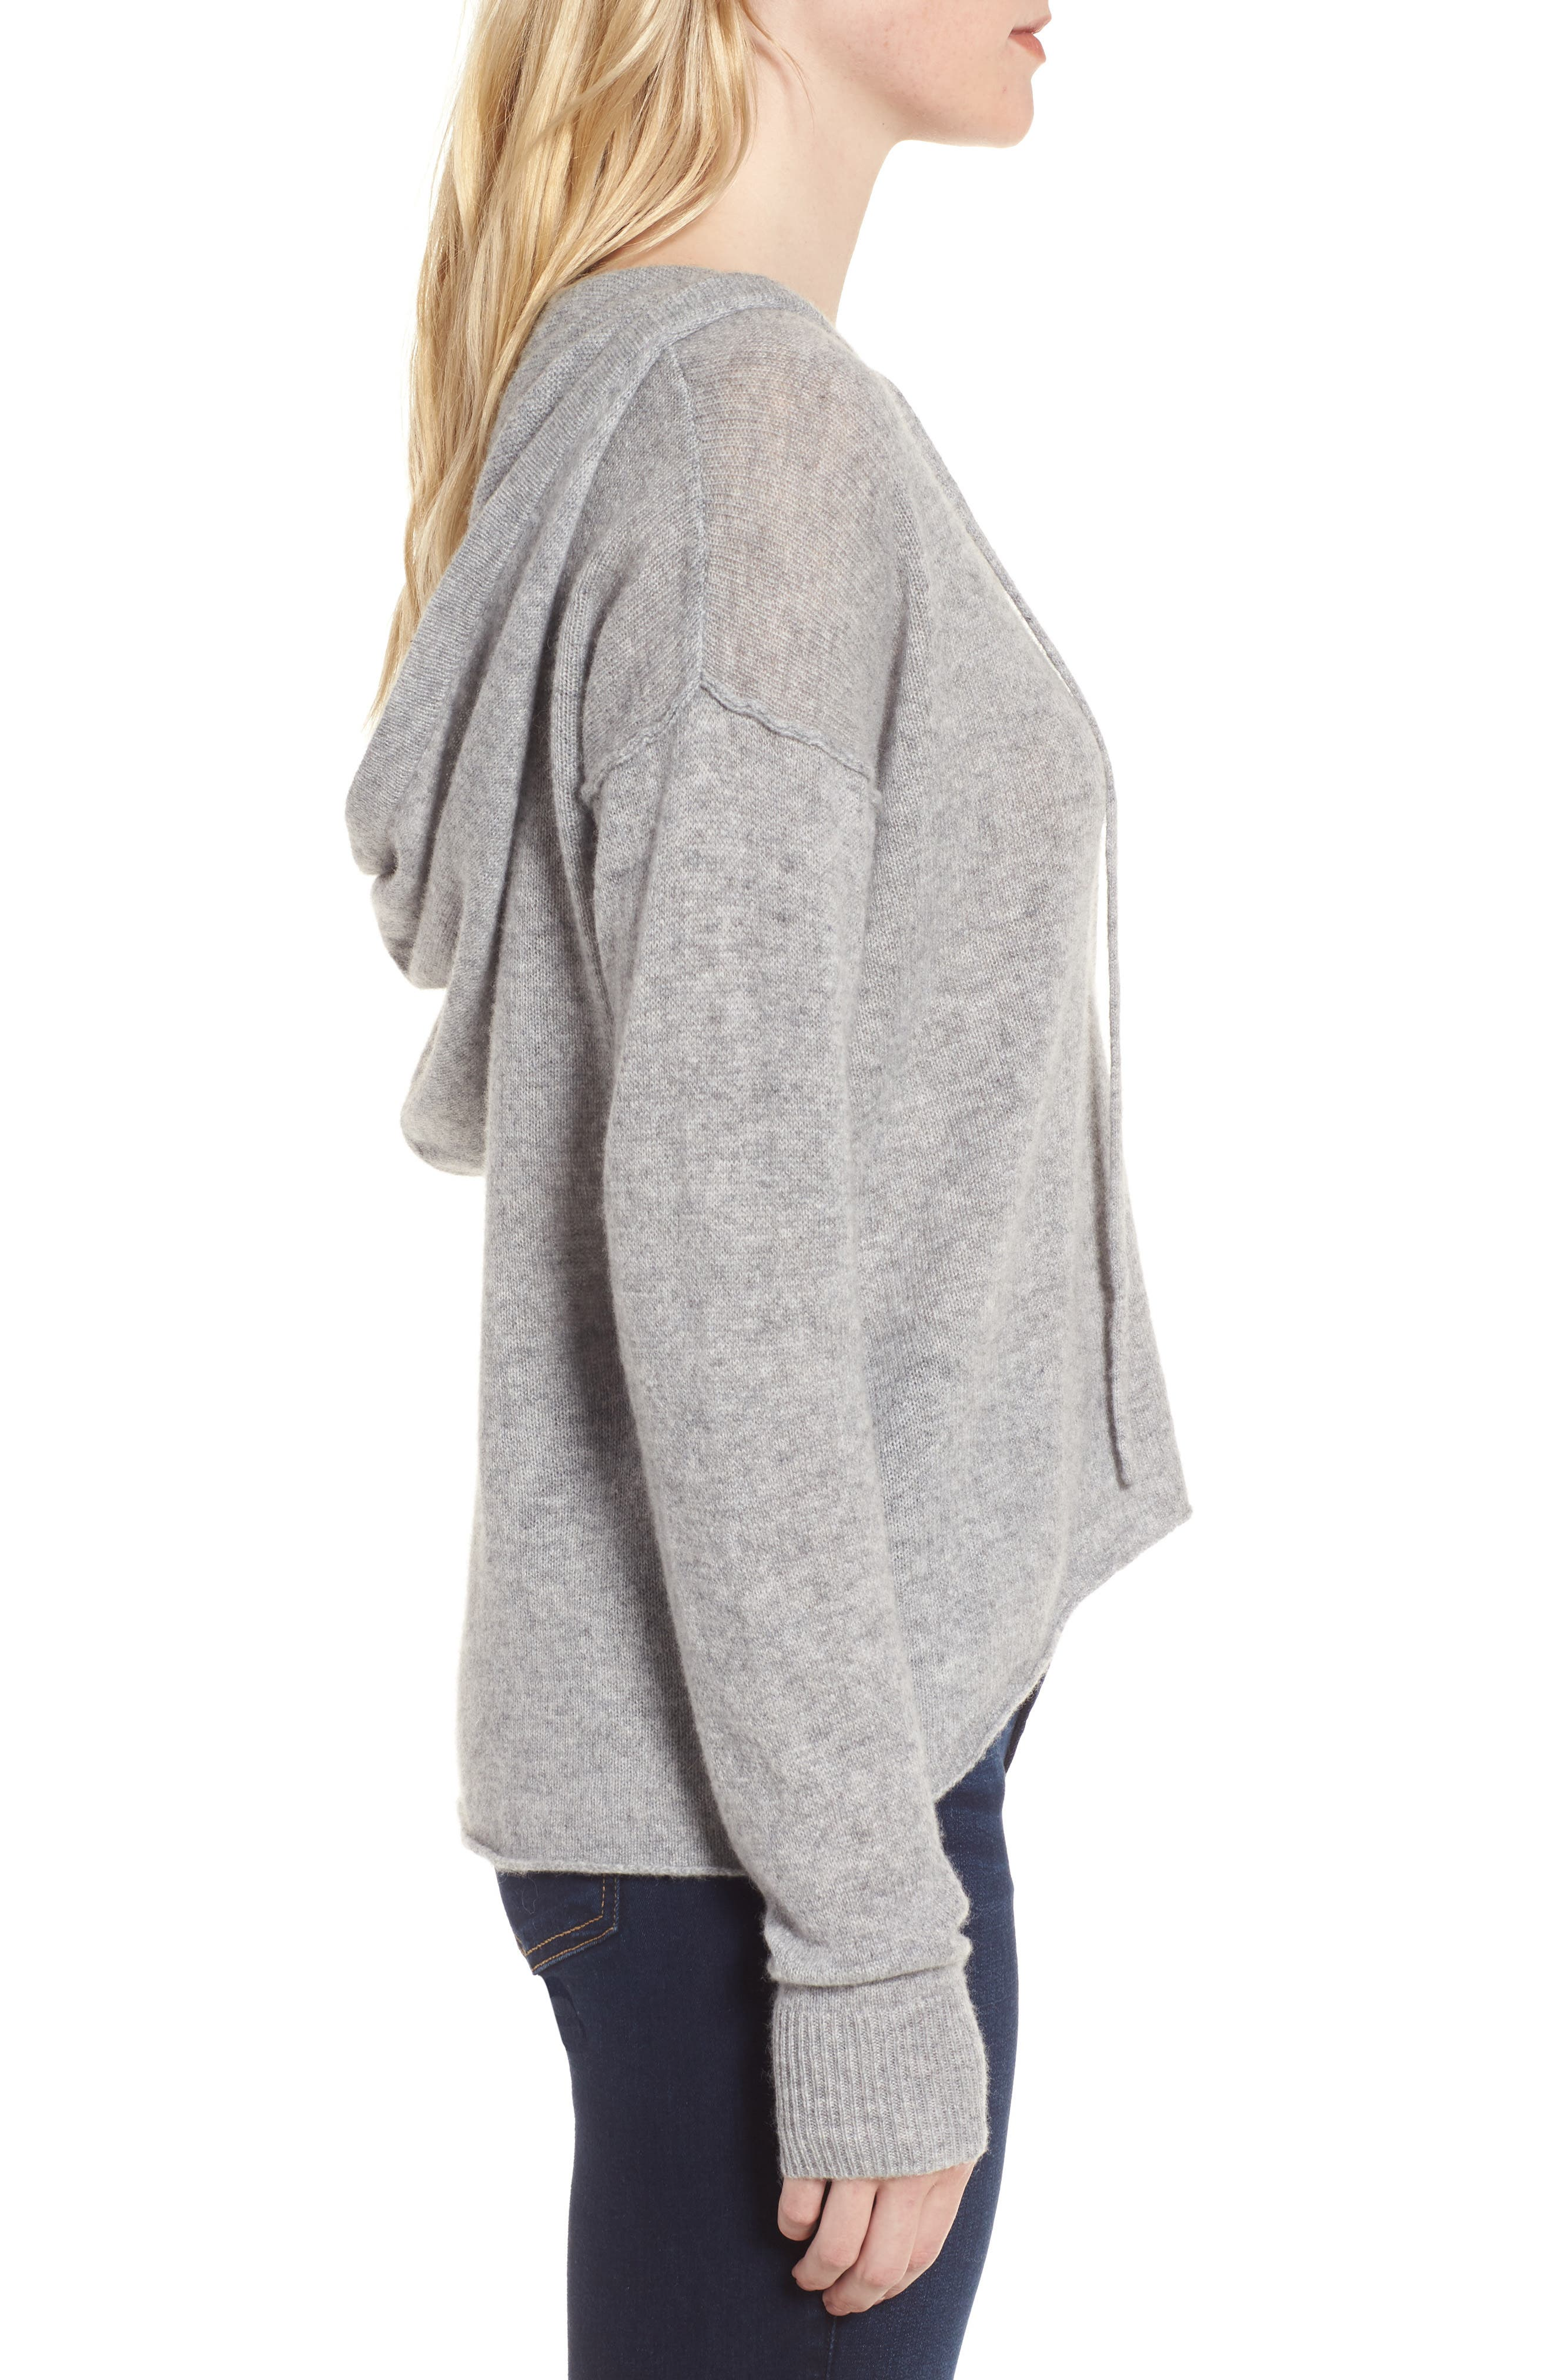 Dakota Cashmere Hooded Sweater,                             Alternate thumbnail 3, color,                             Heather Grey